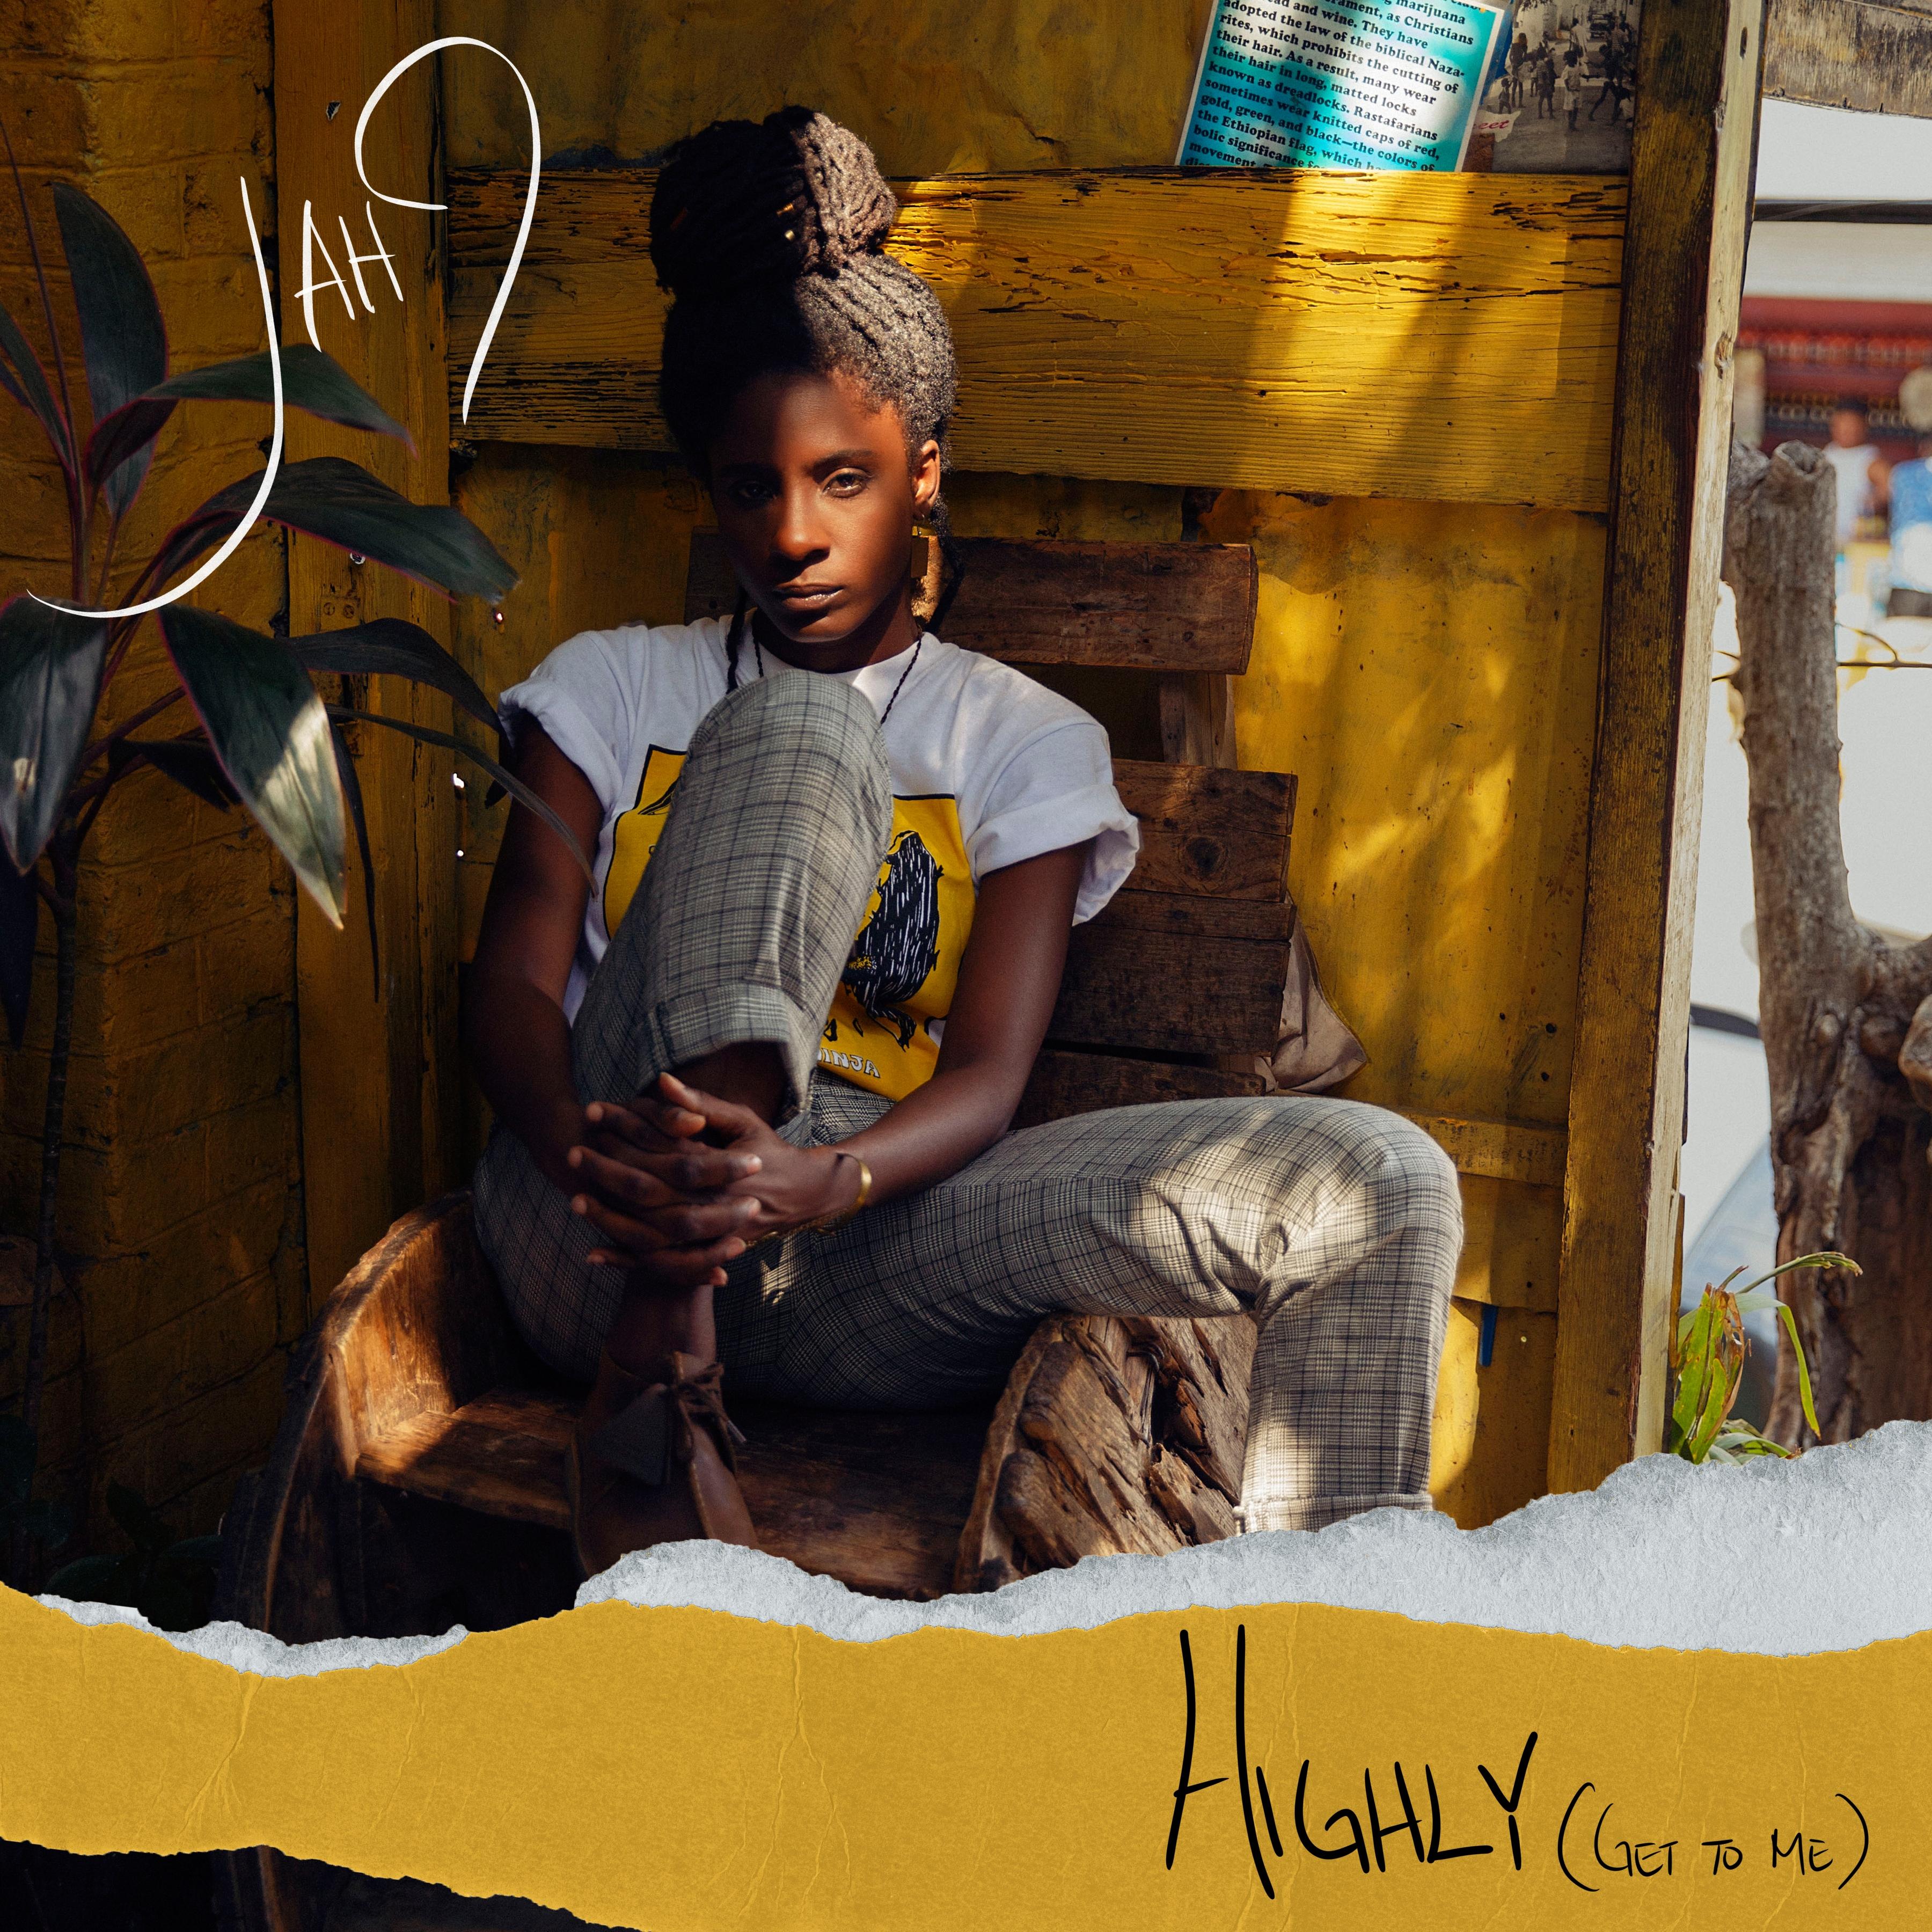 Jah9 - Highly (Get To Me) - Artwork